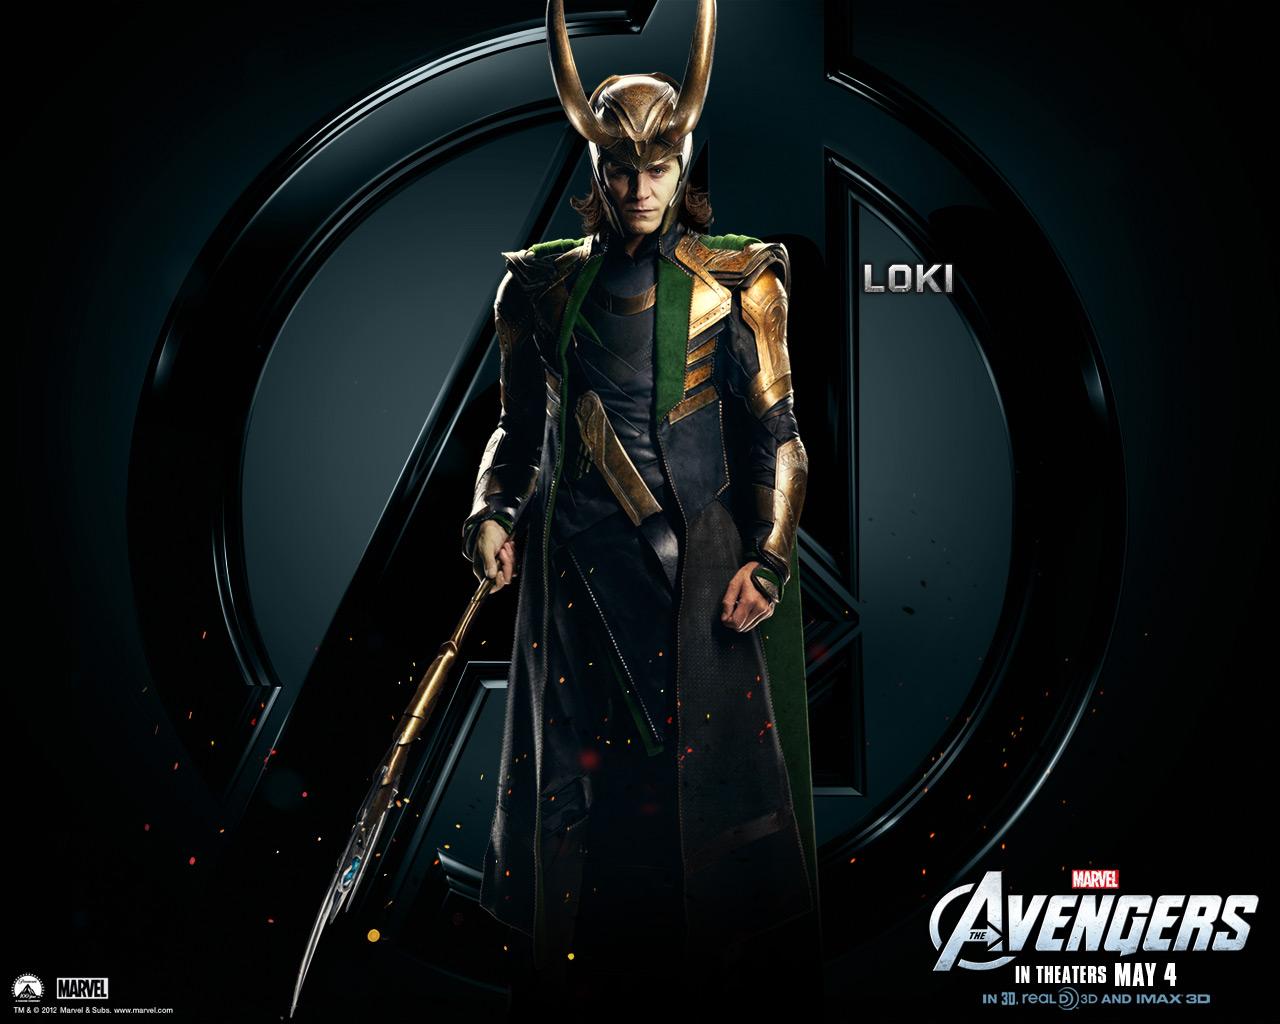 Image - Loki-the-avengers-wallpaper.jpg | Marvel Movies